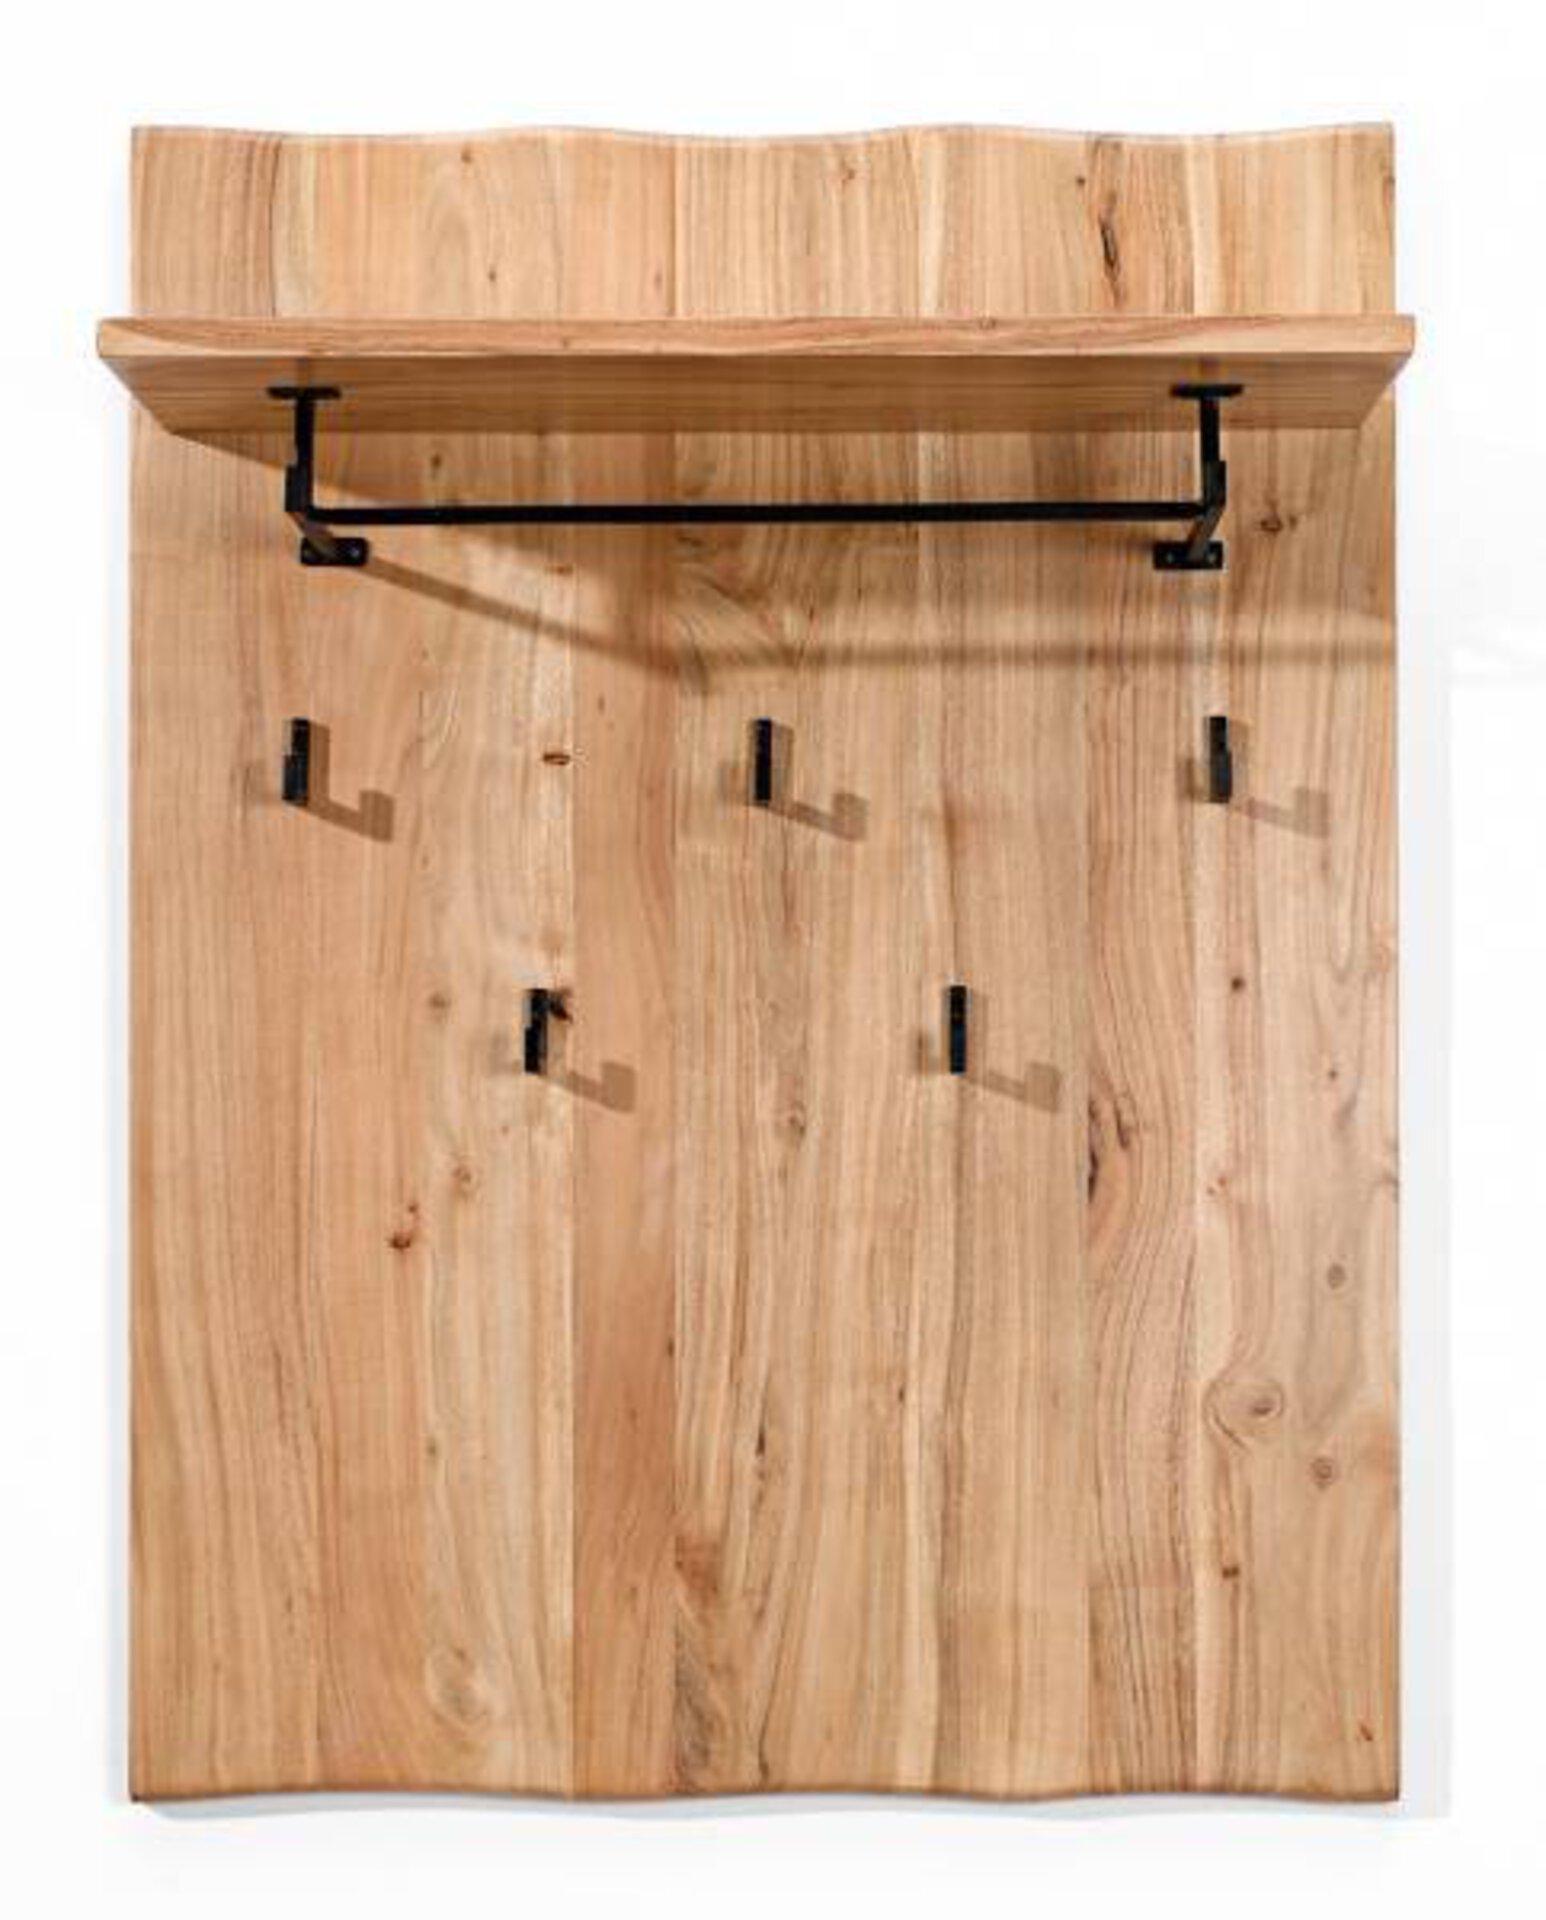 Garderobenpaneel Edge Vito Holz braun 30 x 120 x 90 cm